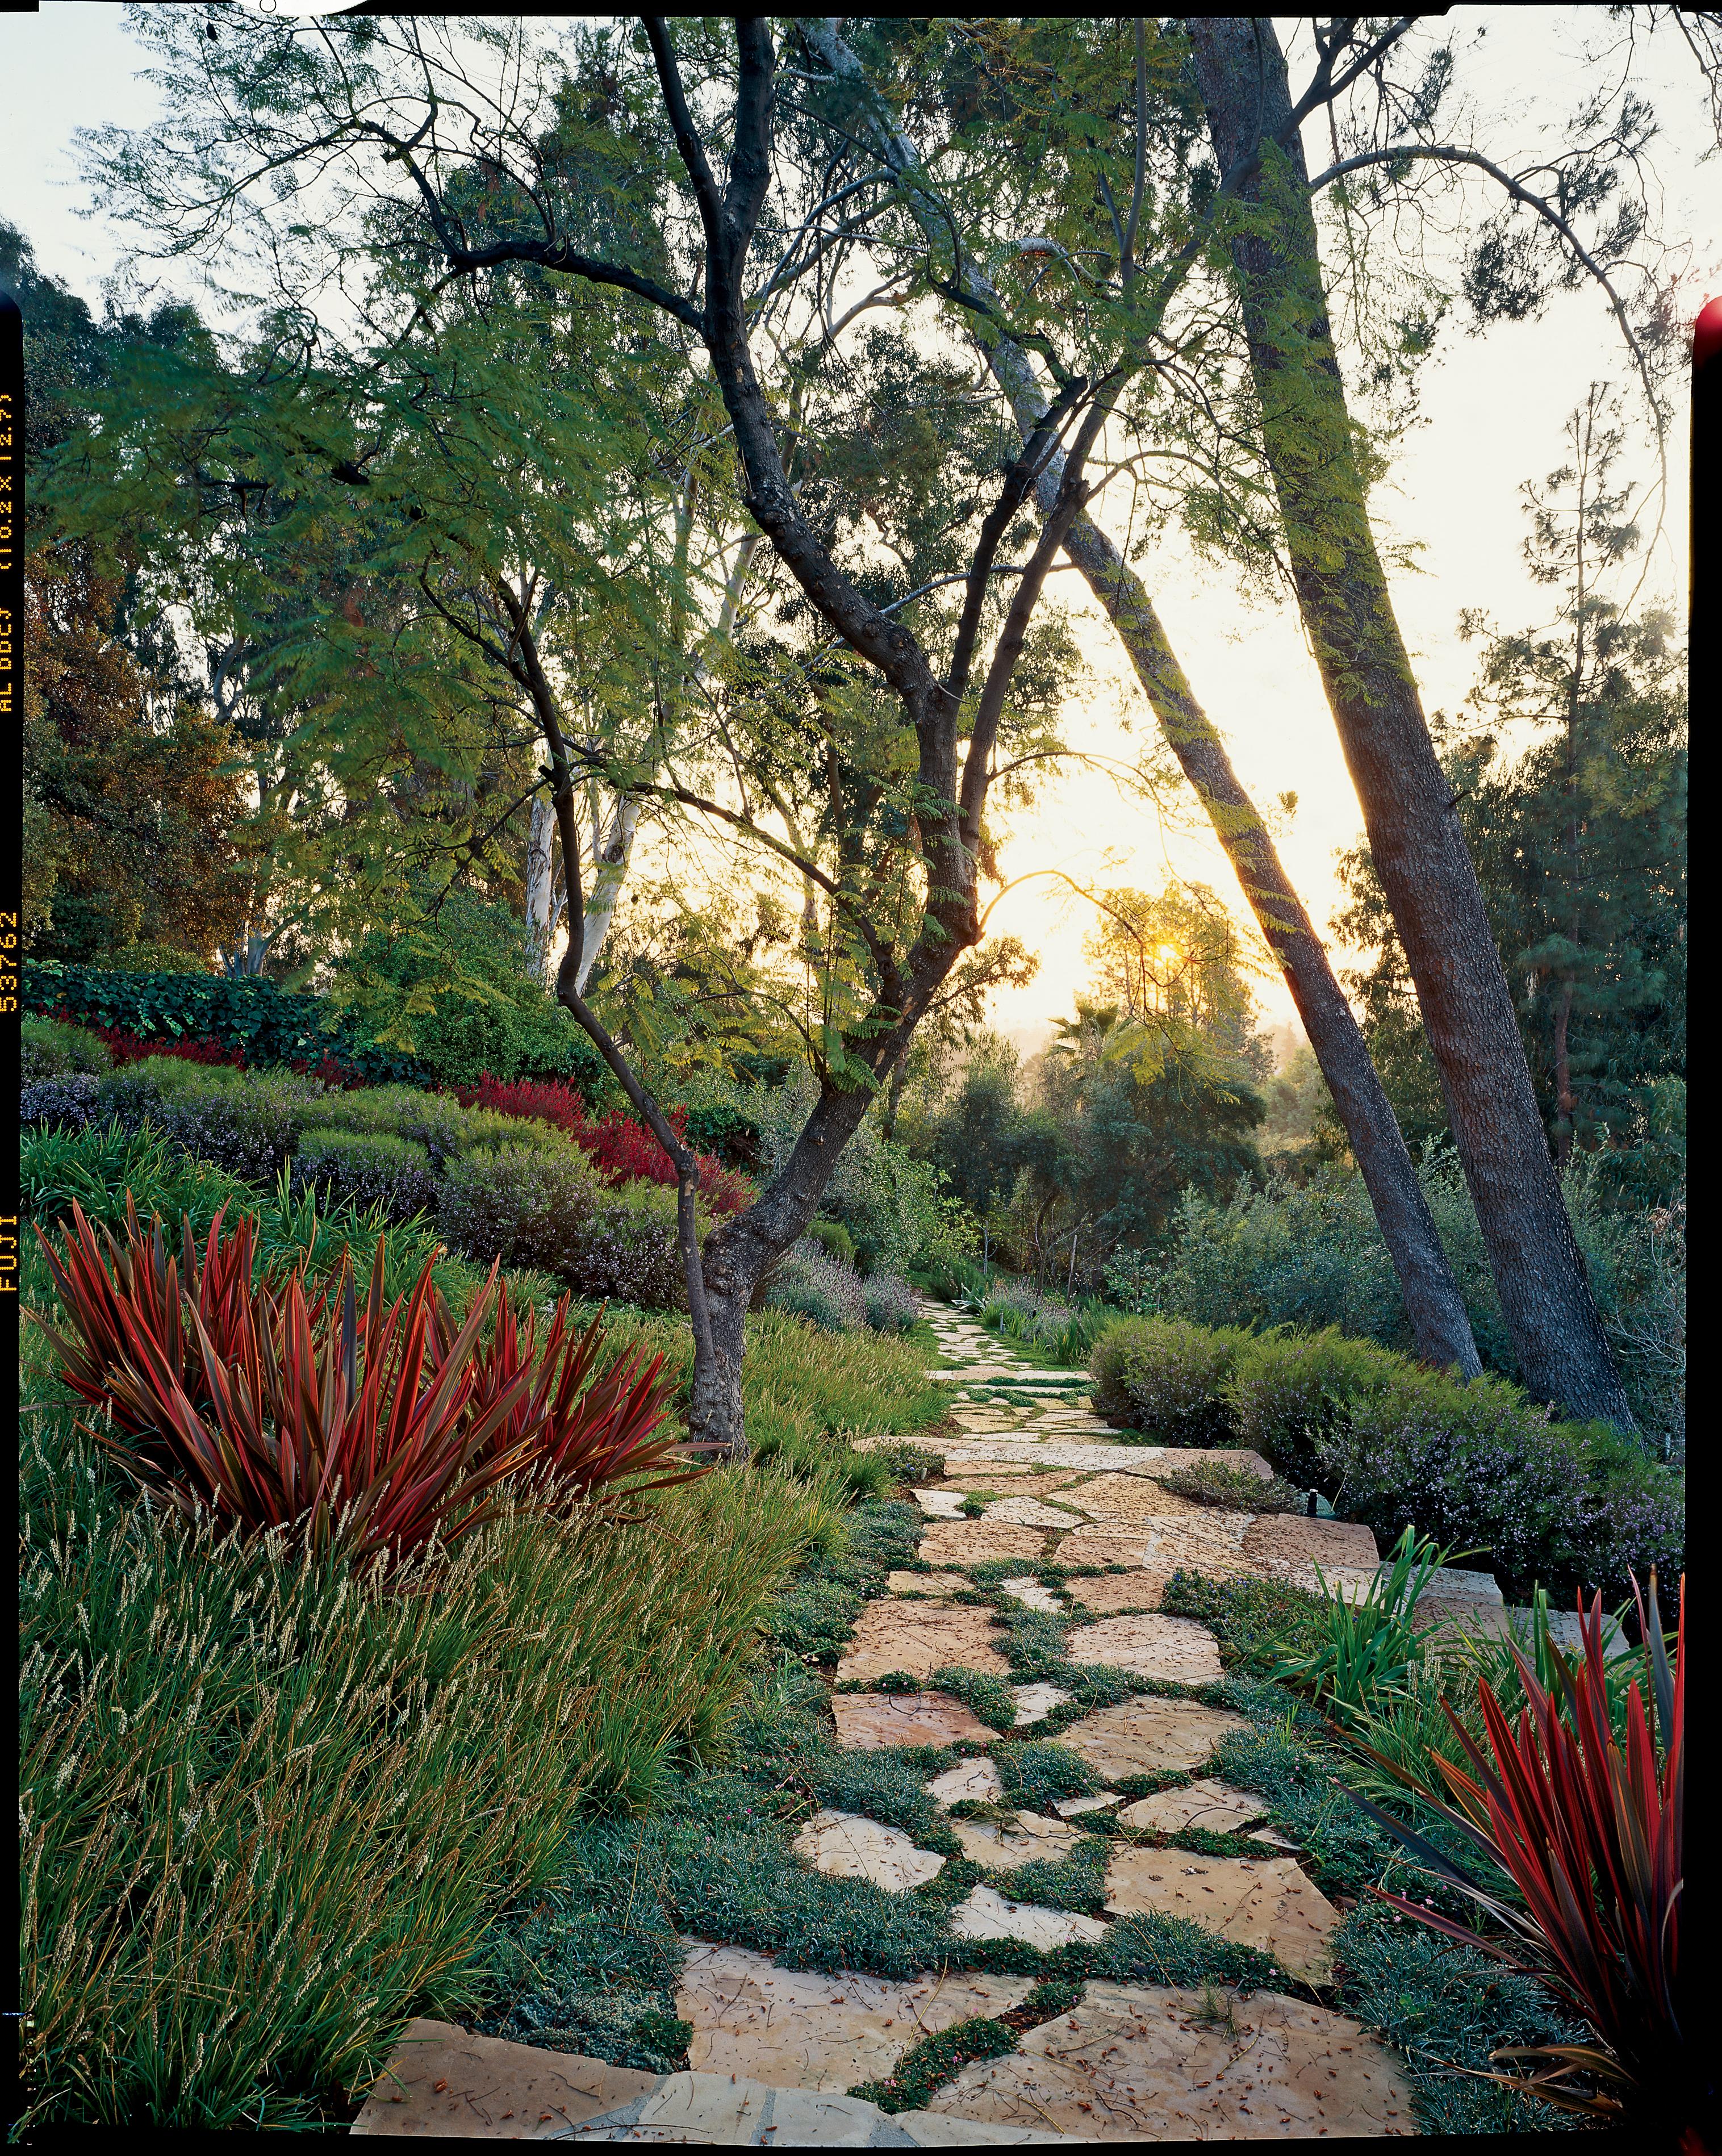 Garden Path Landscaping 38 gorgeous garden paths sunset magazine wooded escape workwithnaturefo